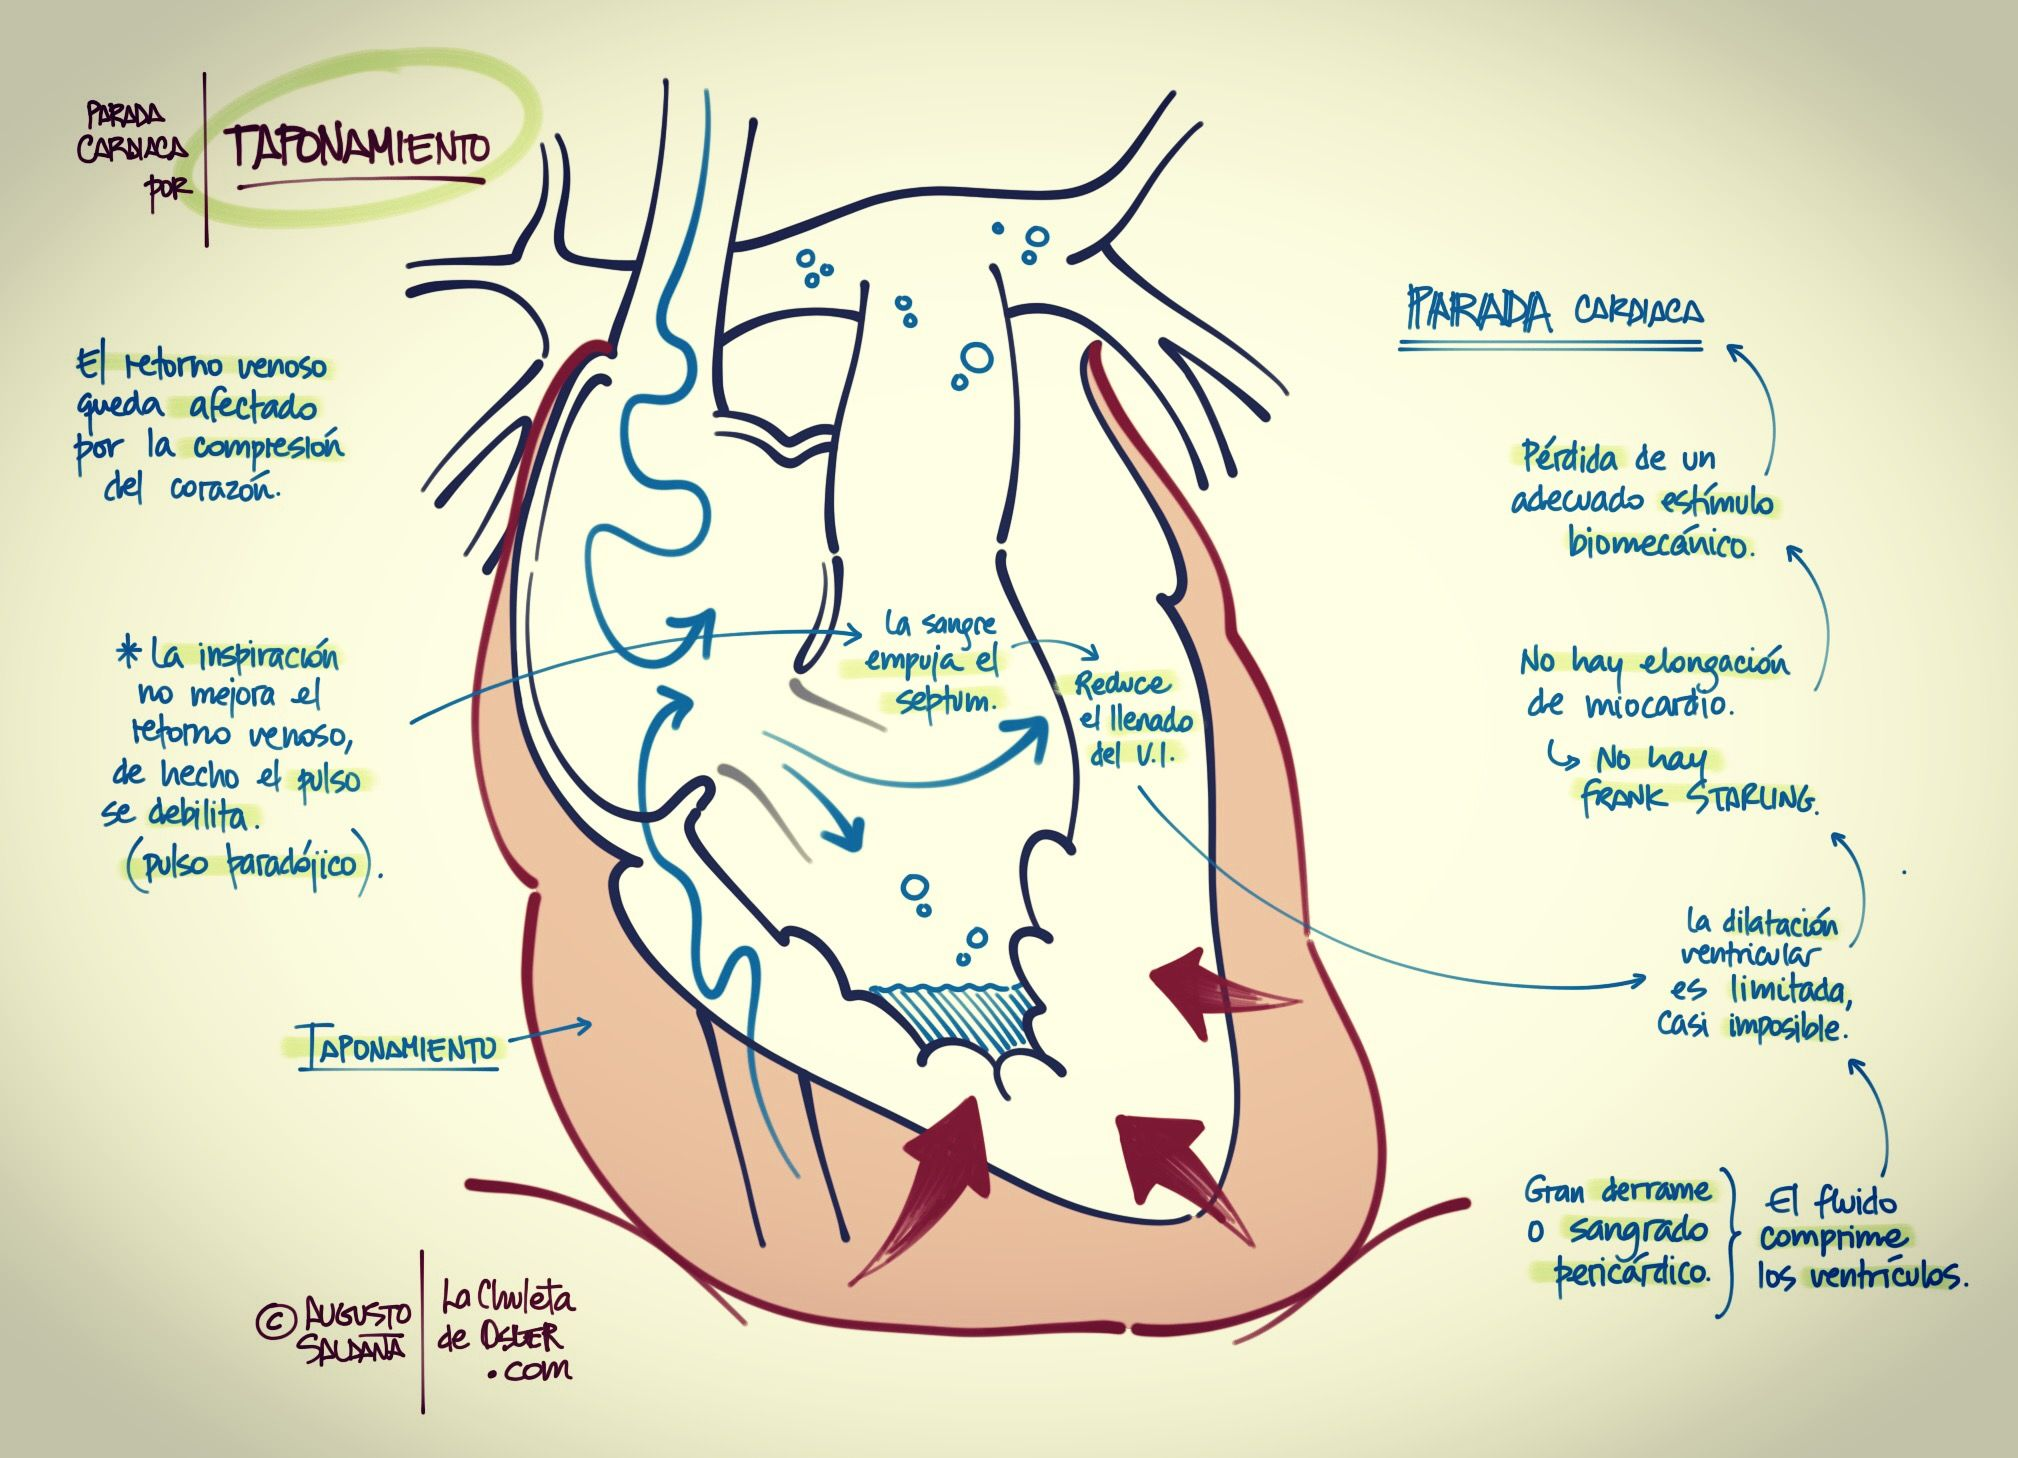 Parada cardiaca por taponamiento cardiaco. Dr. Augusto Saldaña M ...